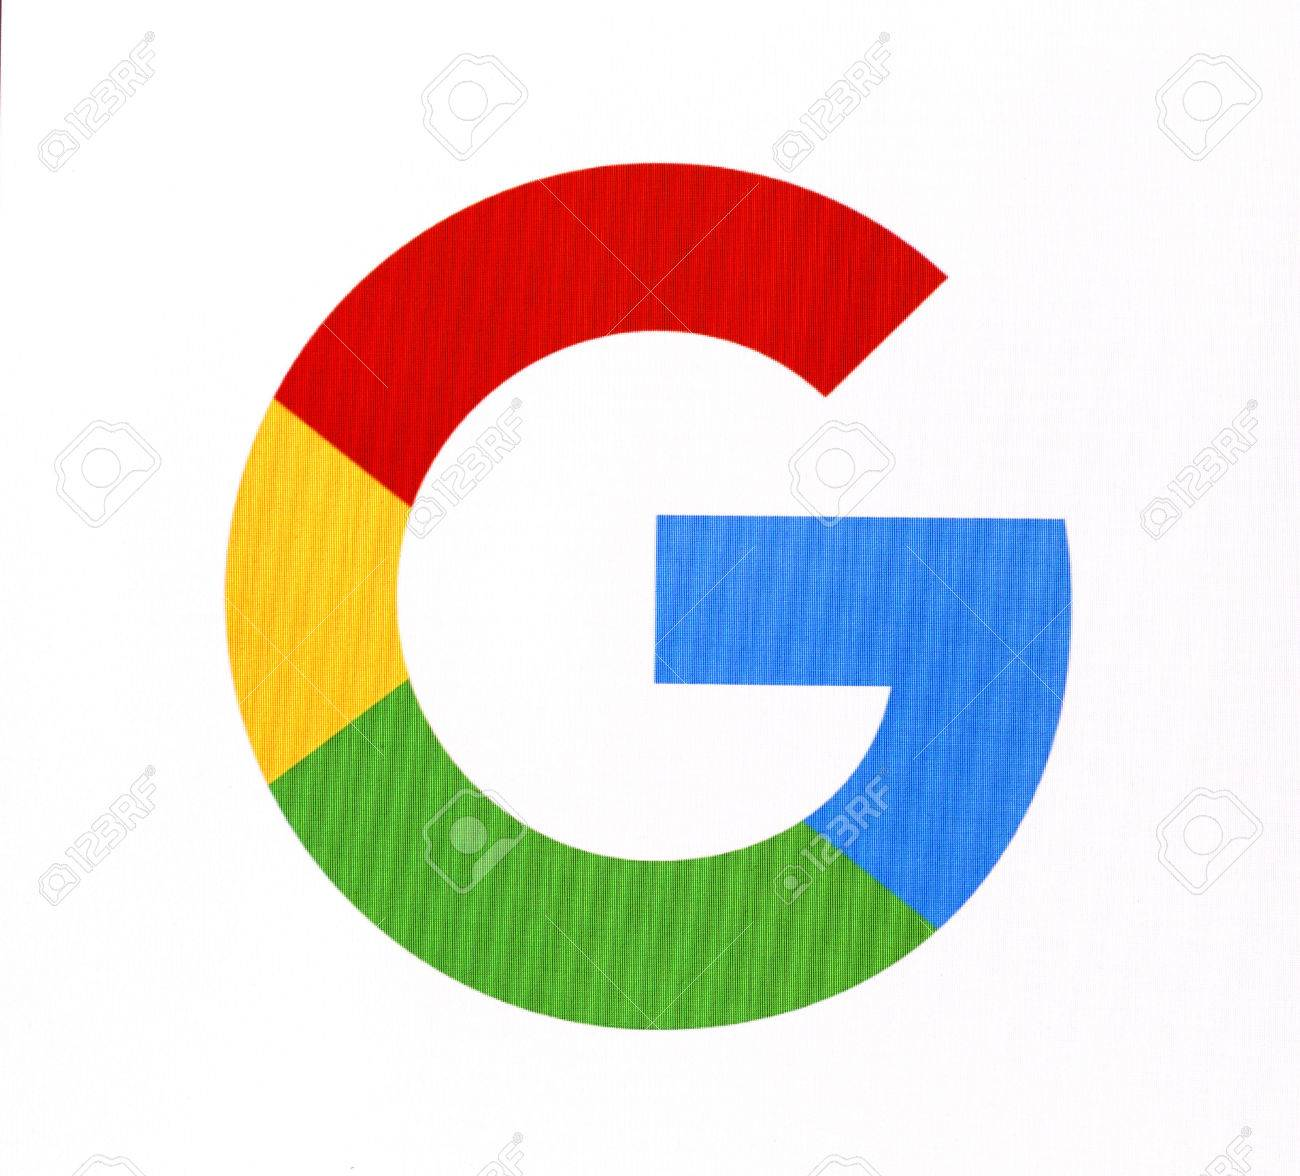 Chisinau, Moldova November 16, 2016: Google logo on pc screen. Google it is the largest Internet search engine, owned of Google Inc. - 66047248